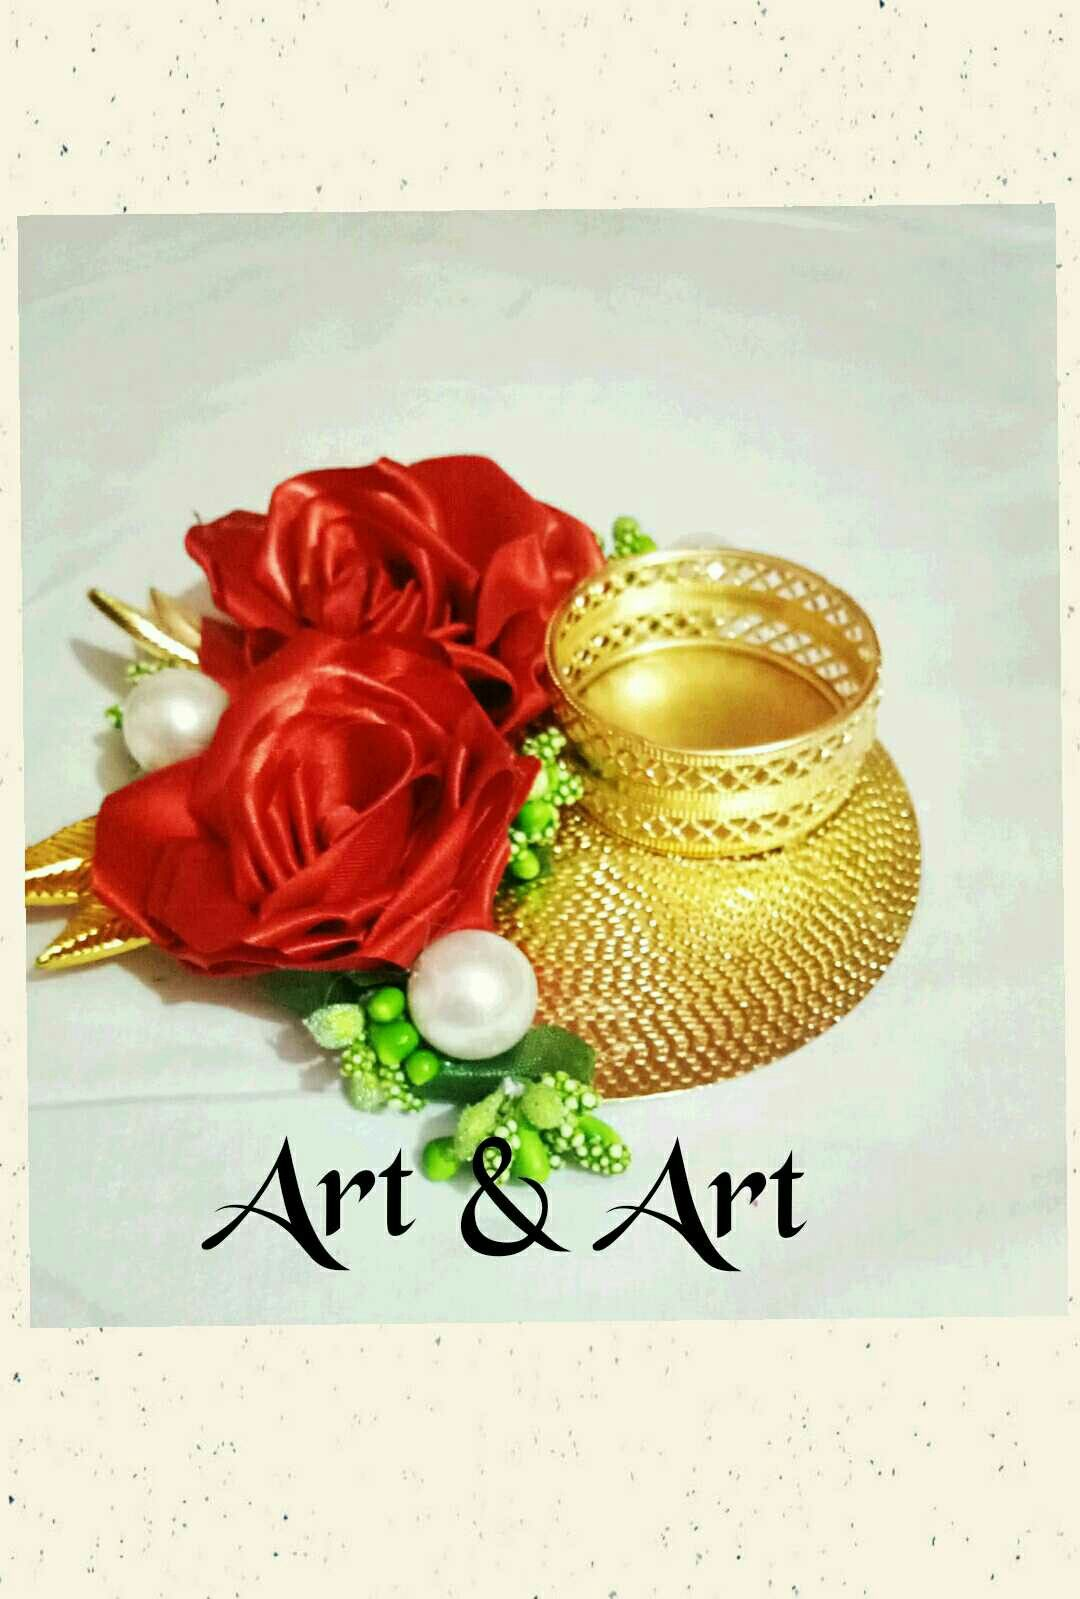 Pin by Varsha chittlangia on Diwali Diwali craft, Candle